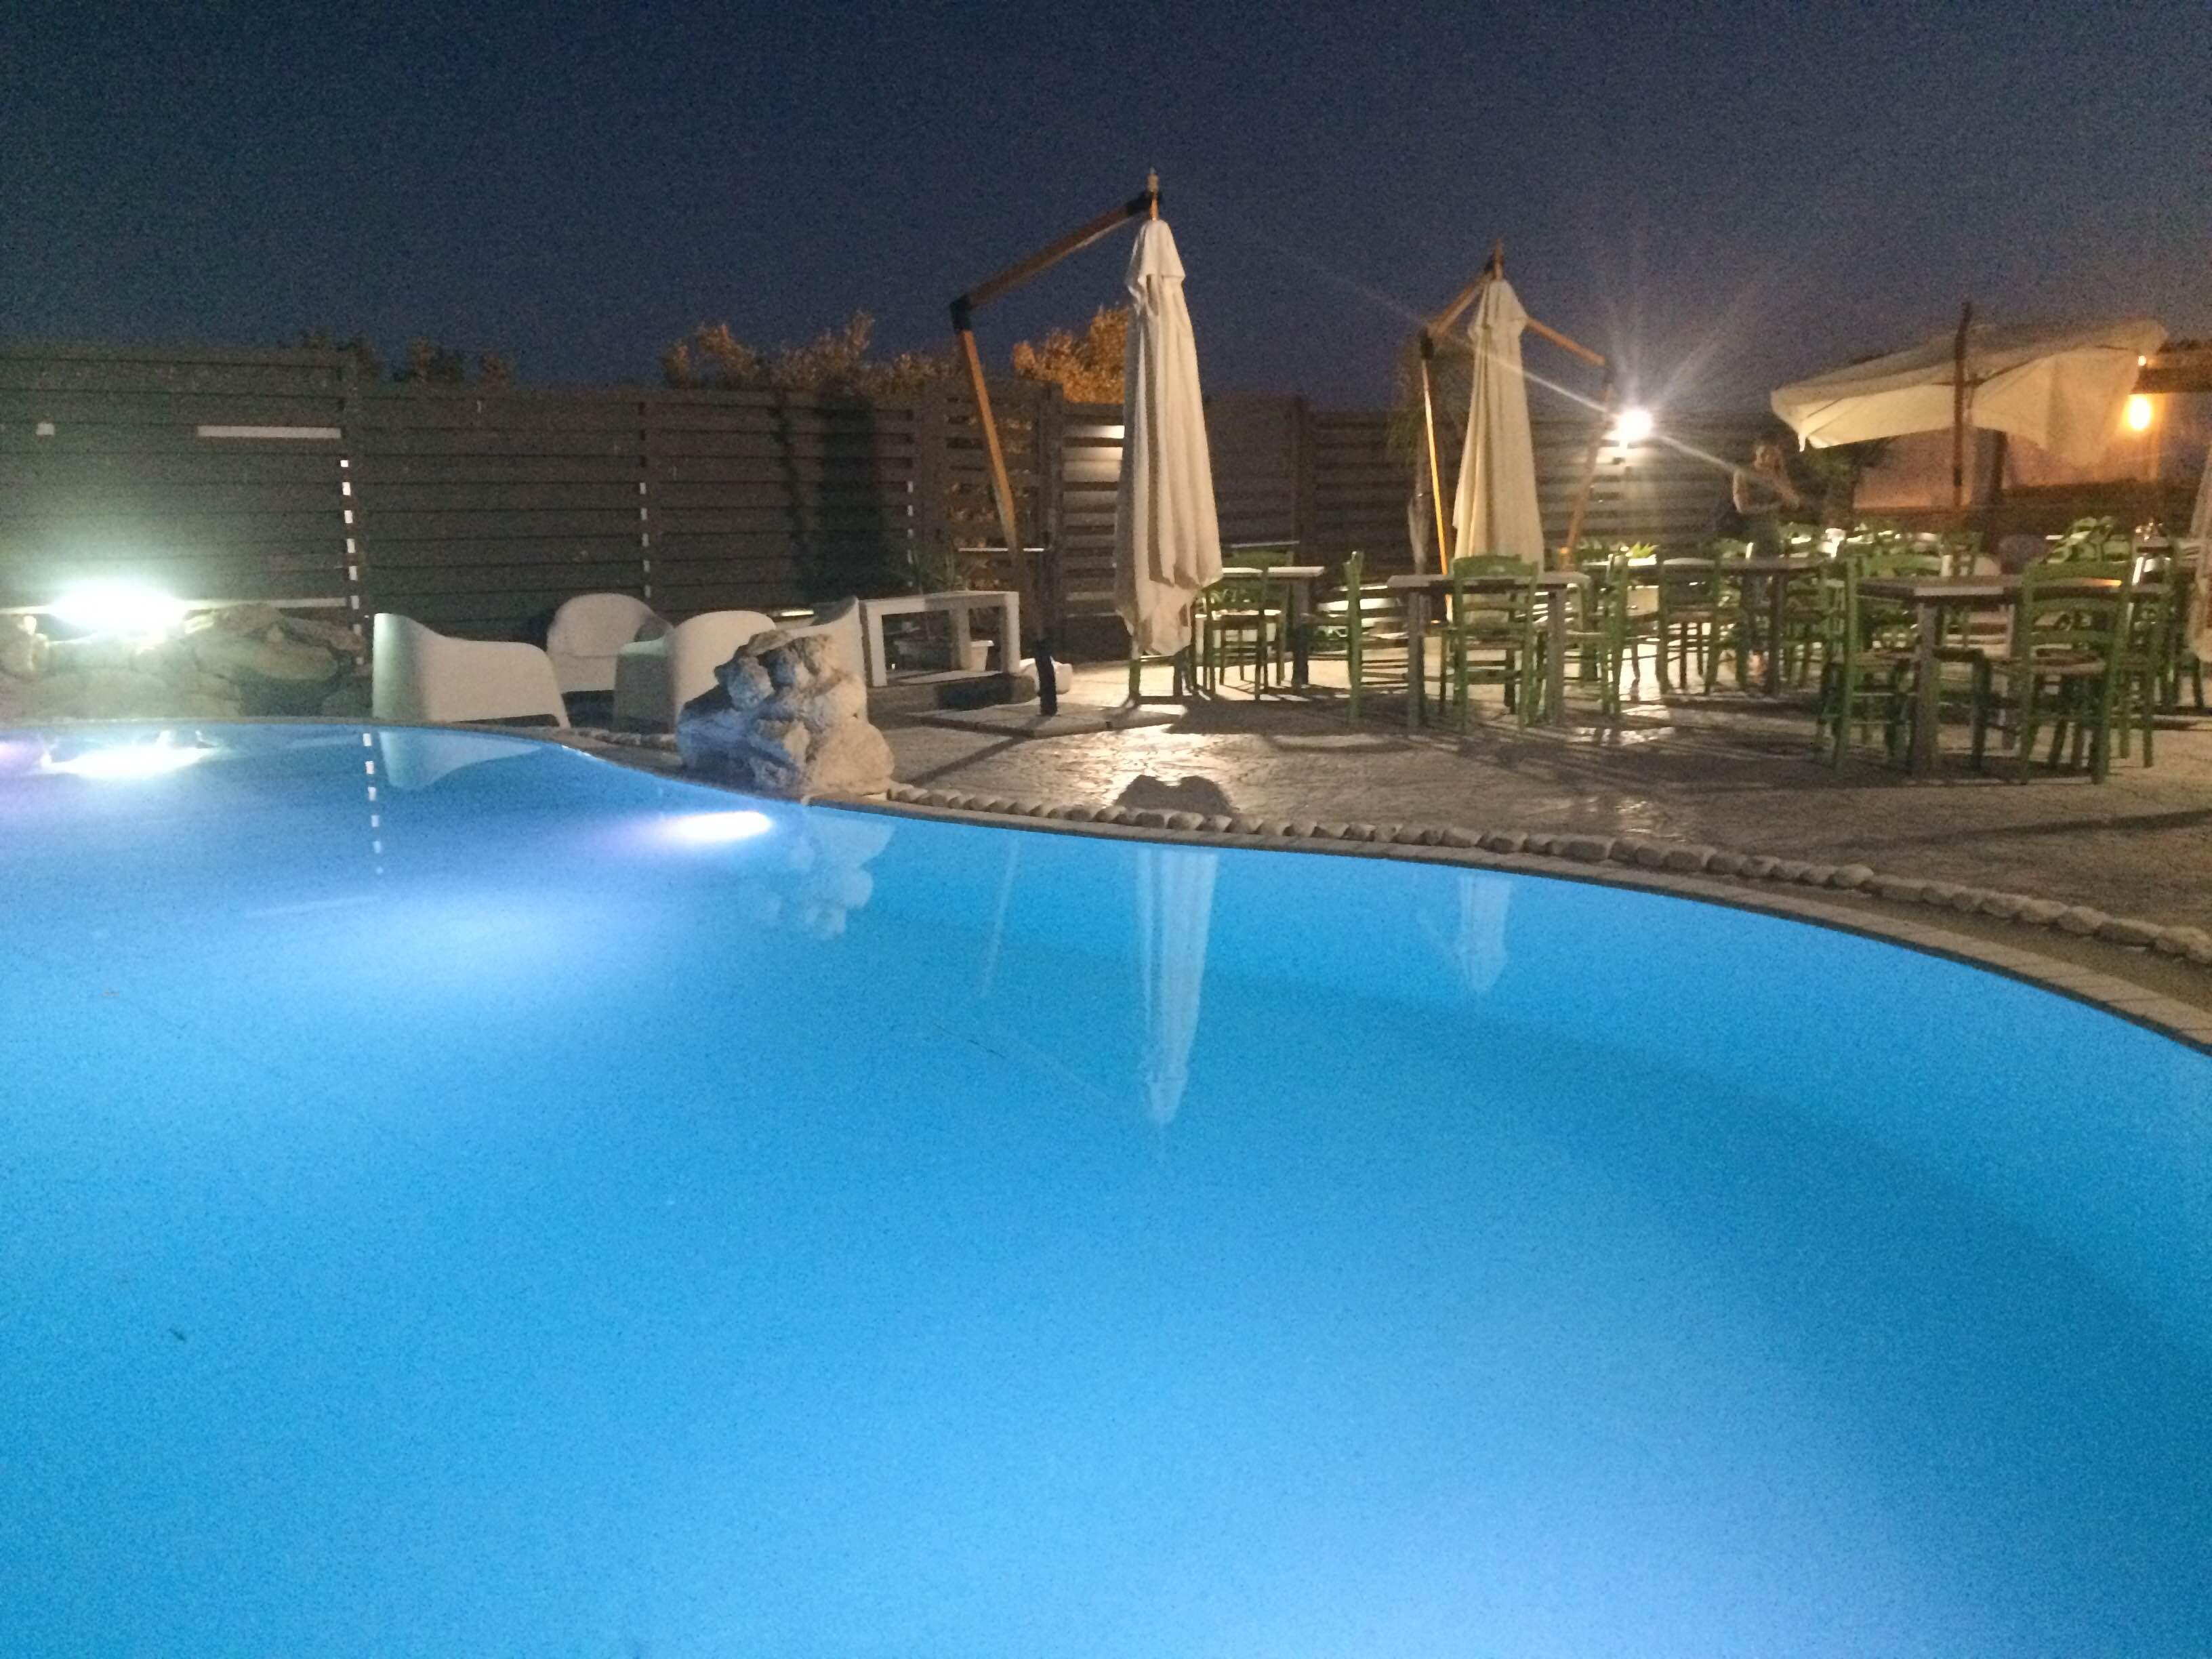 Pubblicit ragusa party in piscina al donnafugata for Piscina party